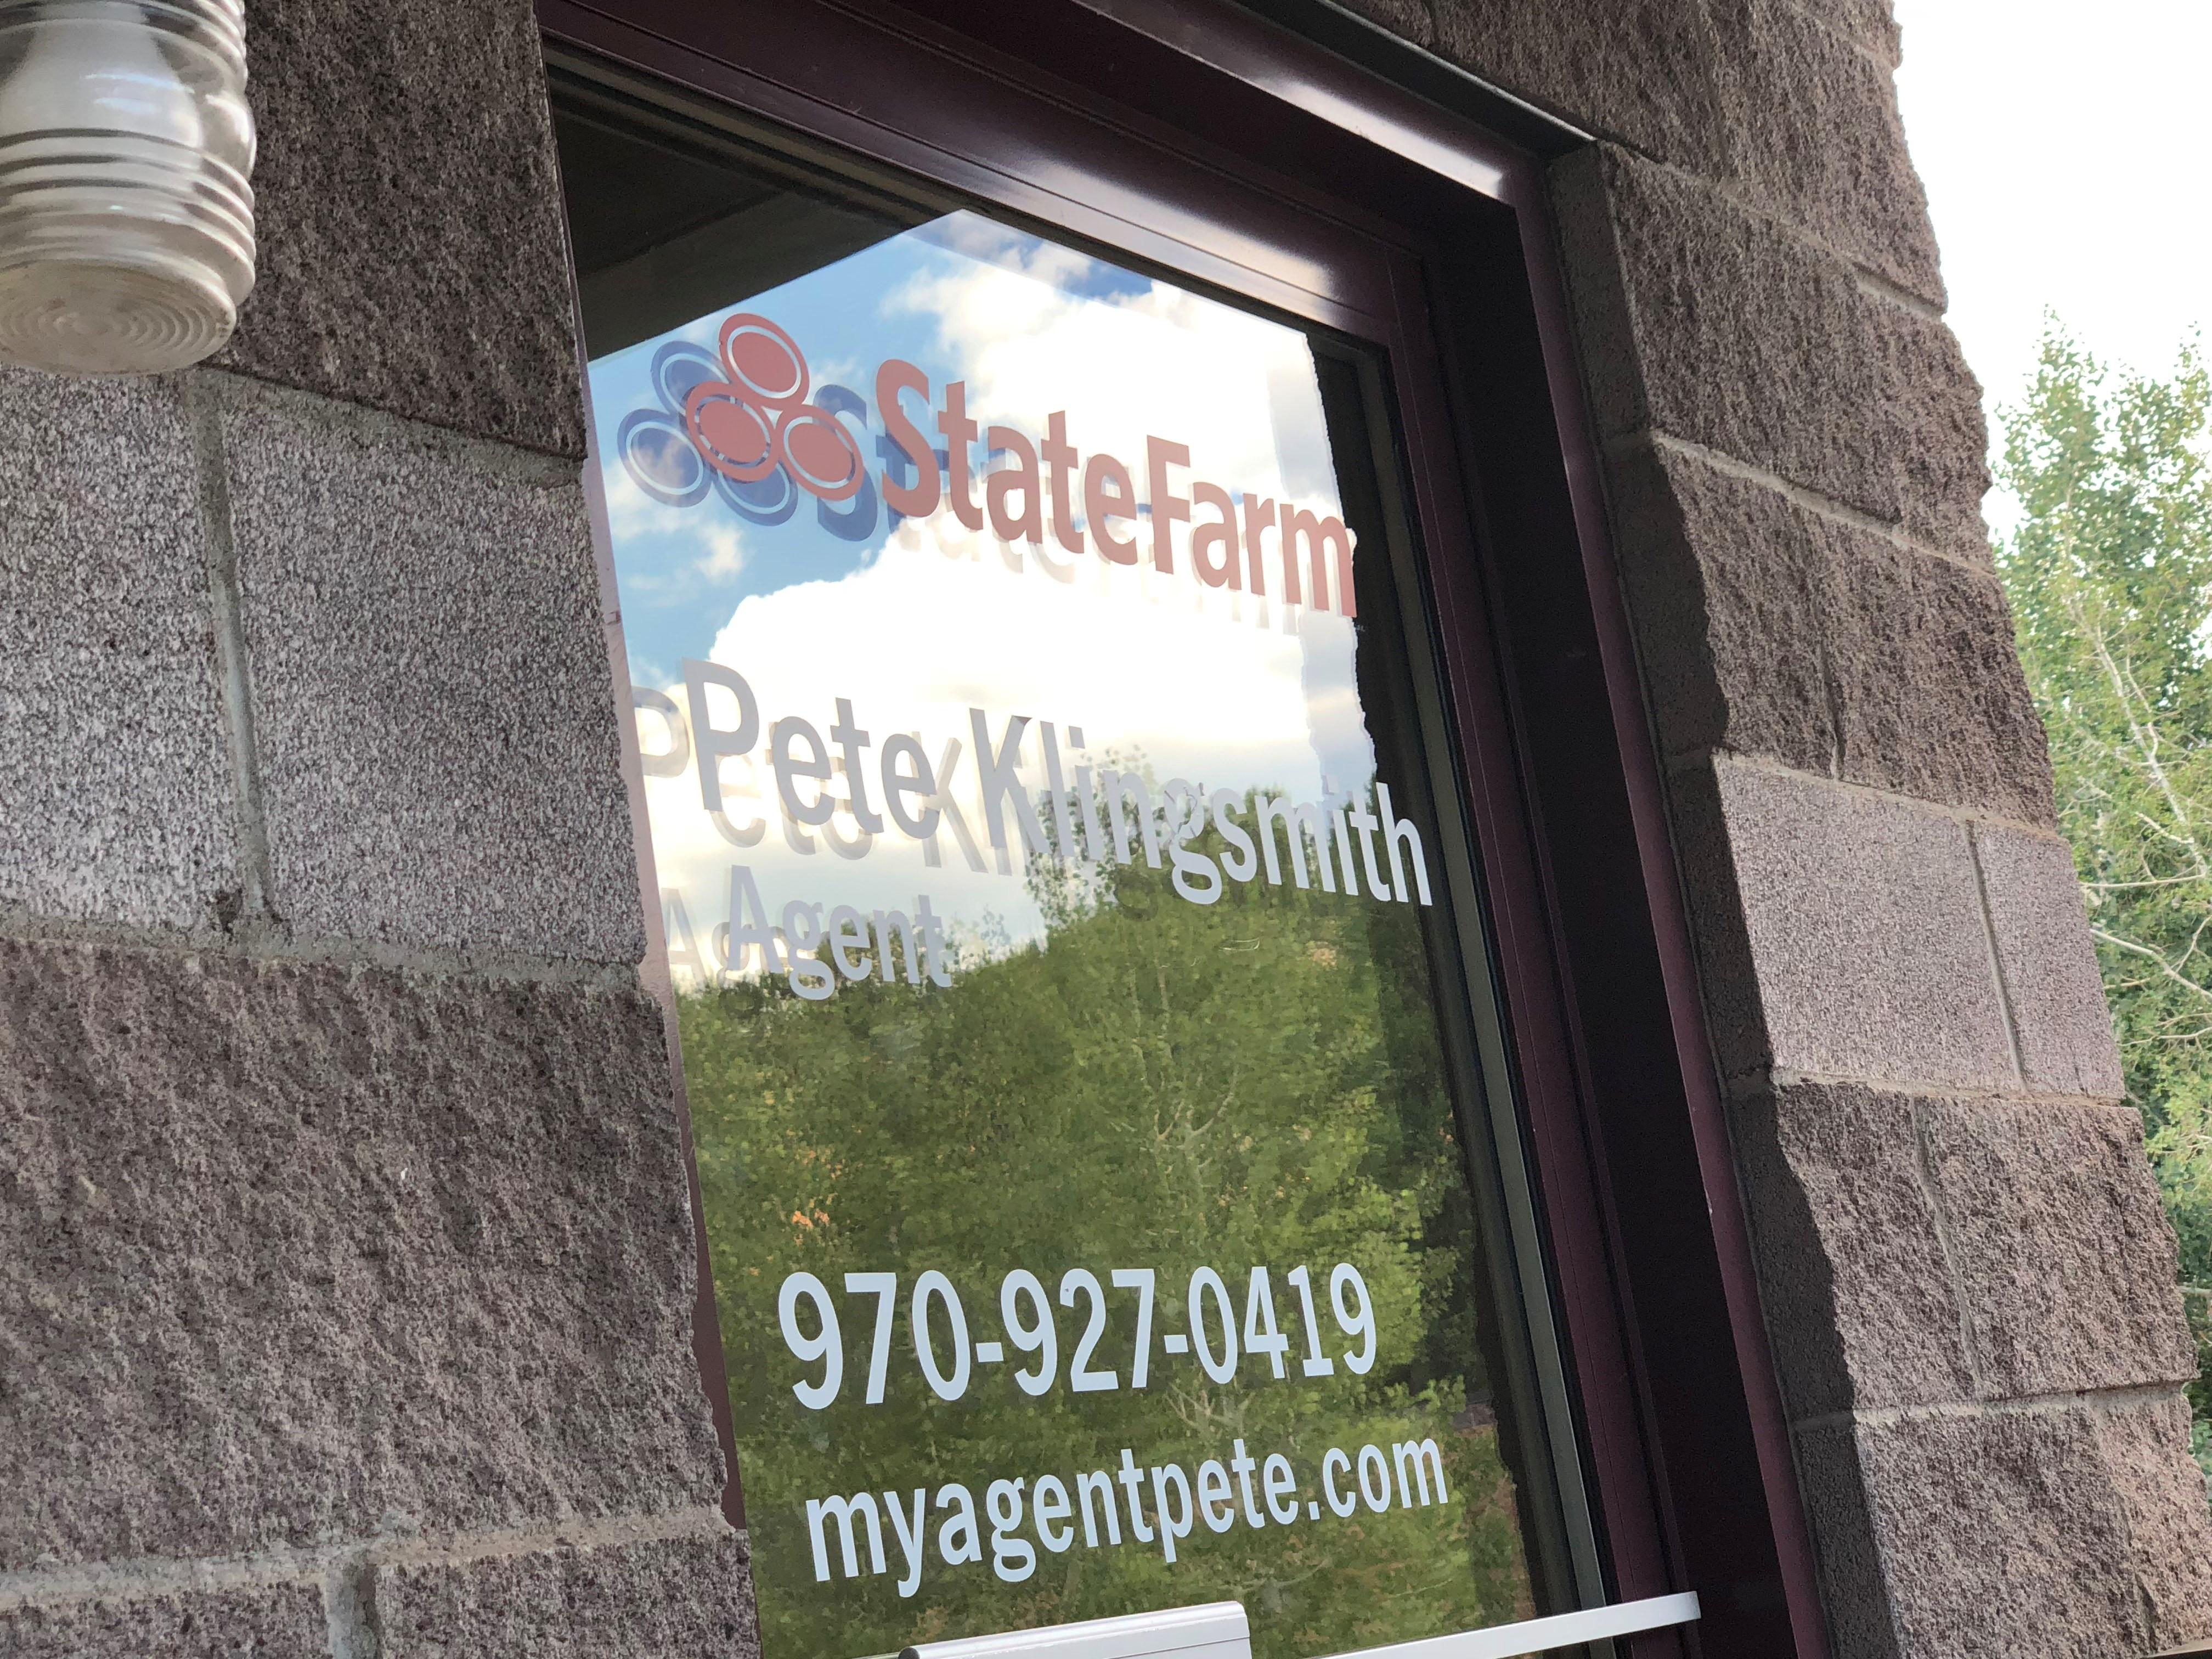 Pete Klingsmith - State Farm Insurance Agent image 2